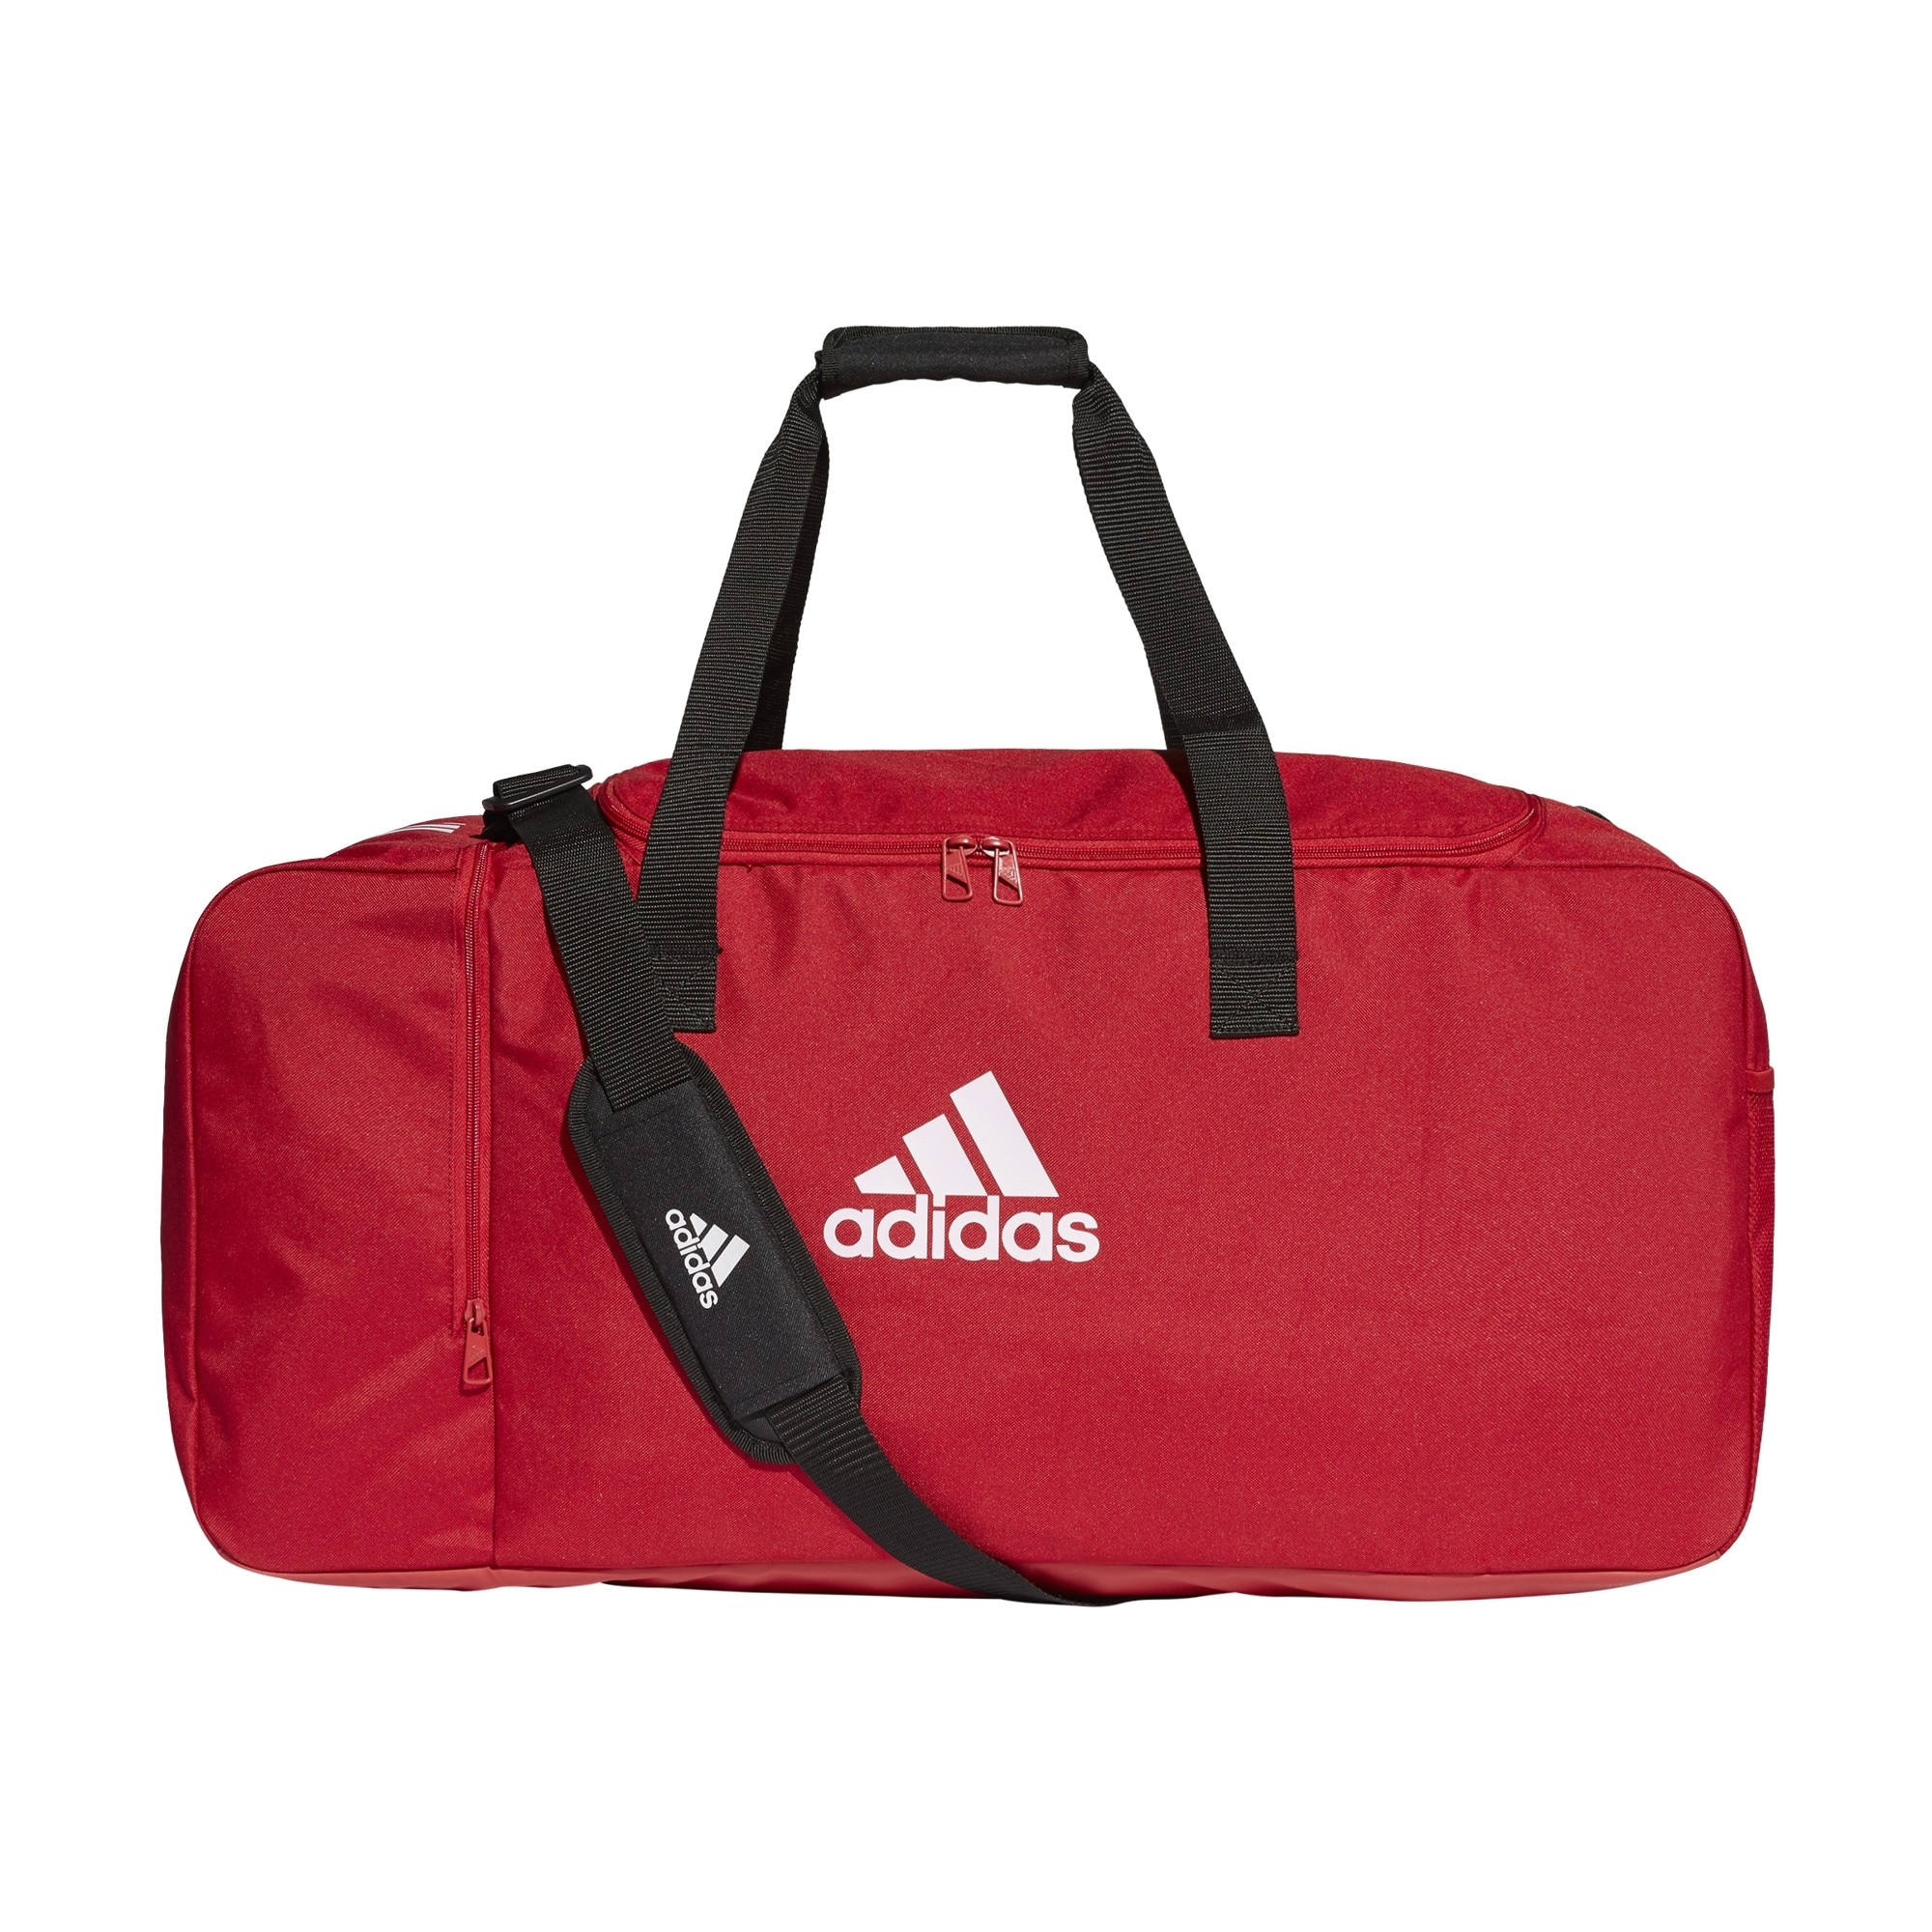 Adidas Tiro 19 Duffle Fotballbag Large